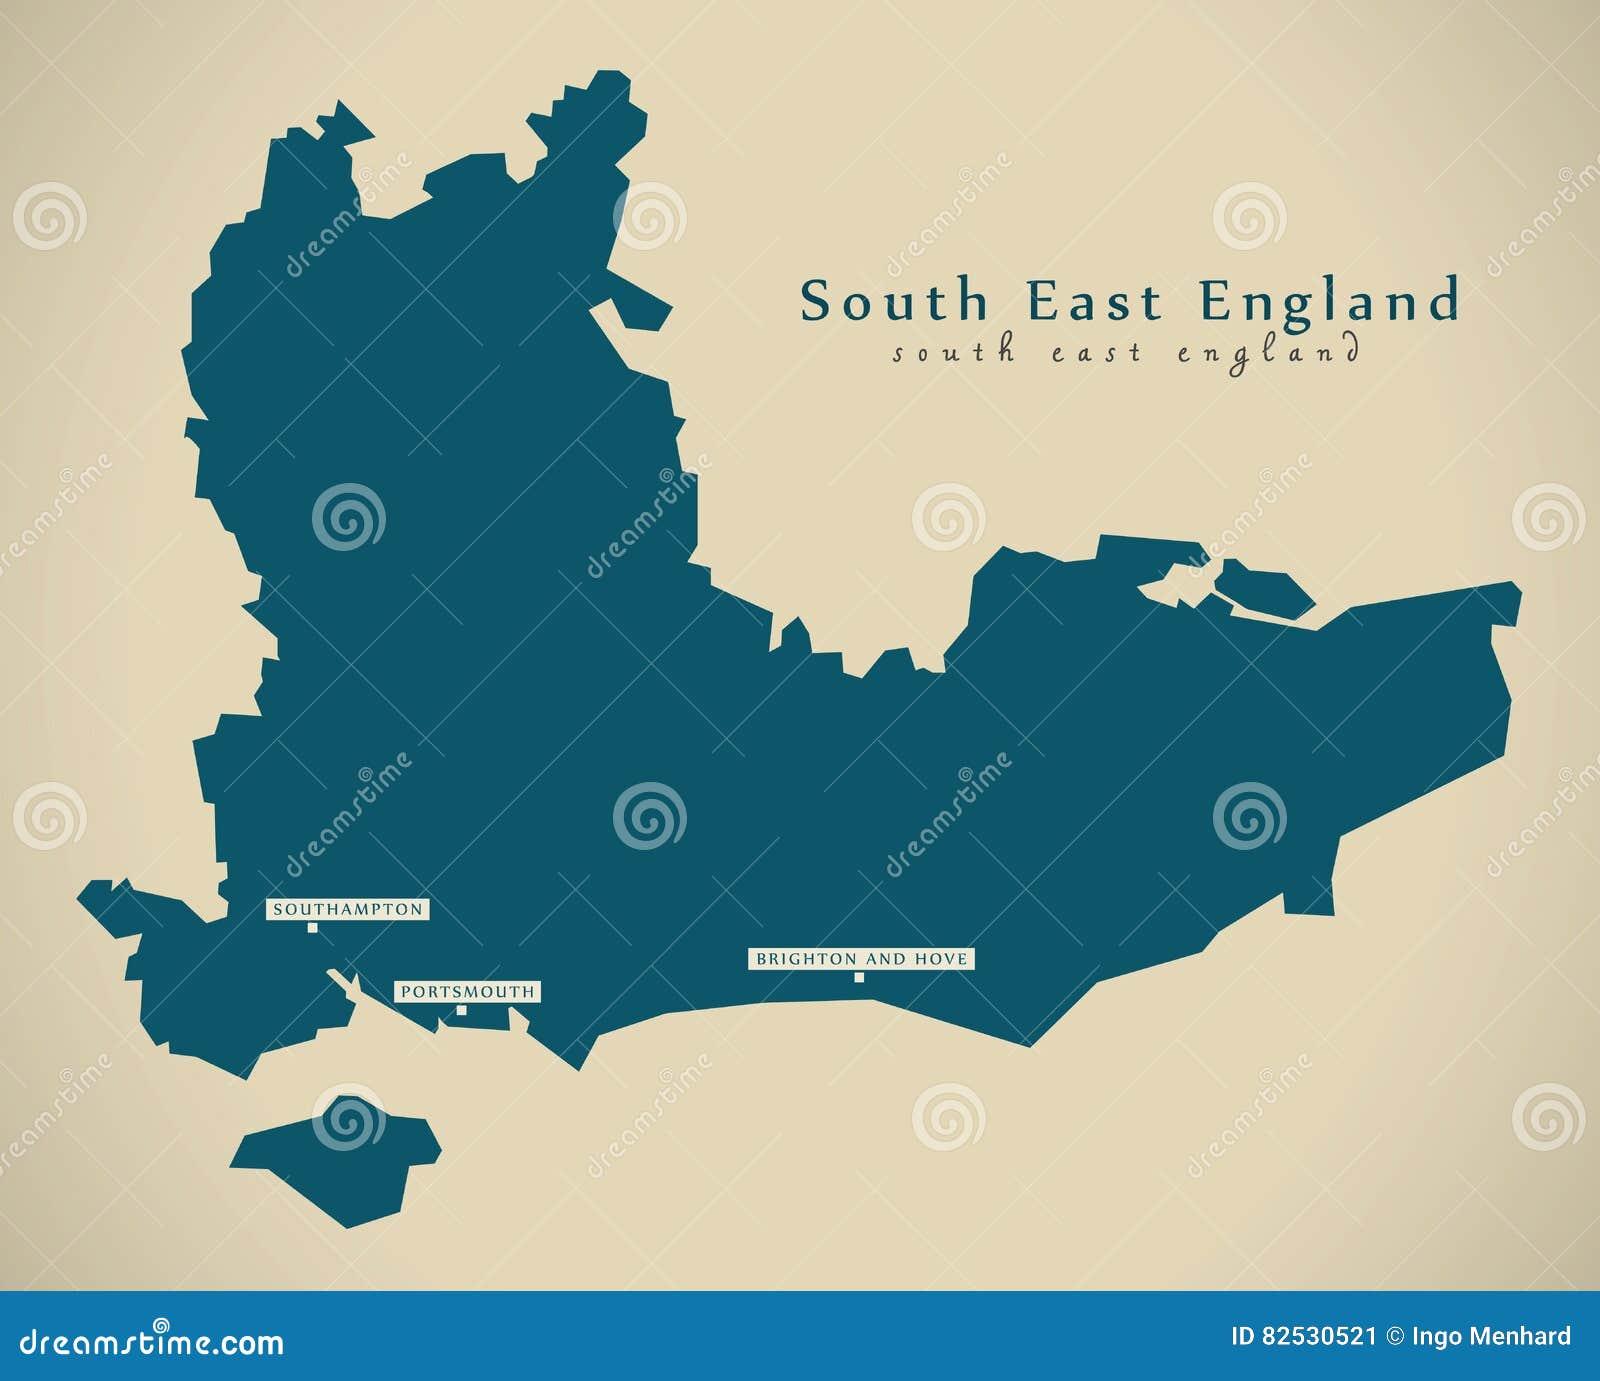 Map Of S England.Modern Map South East England Uk Stock Illustration Illustration